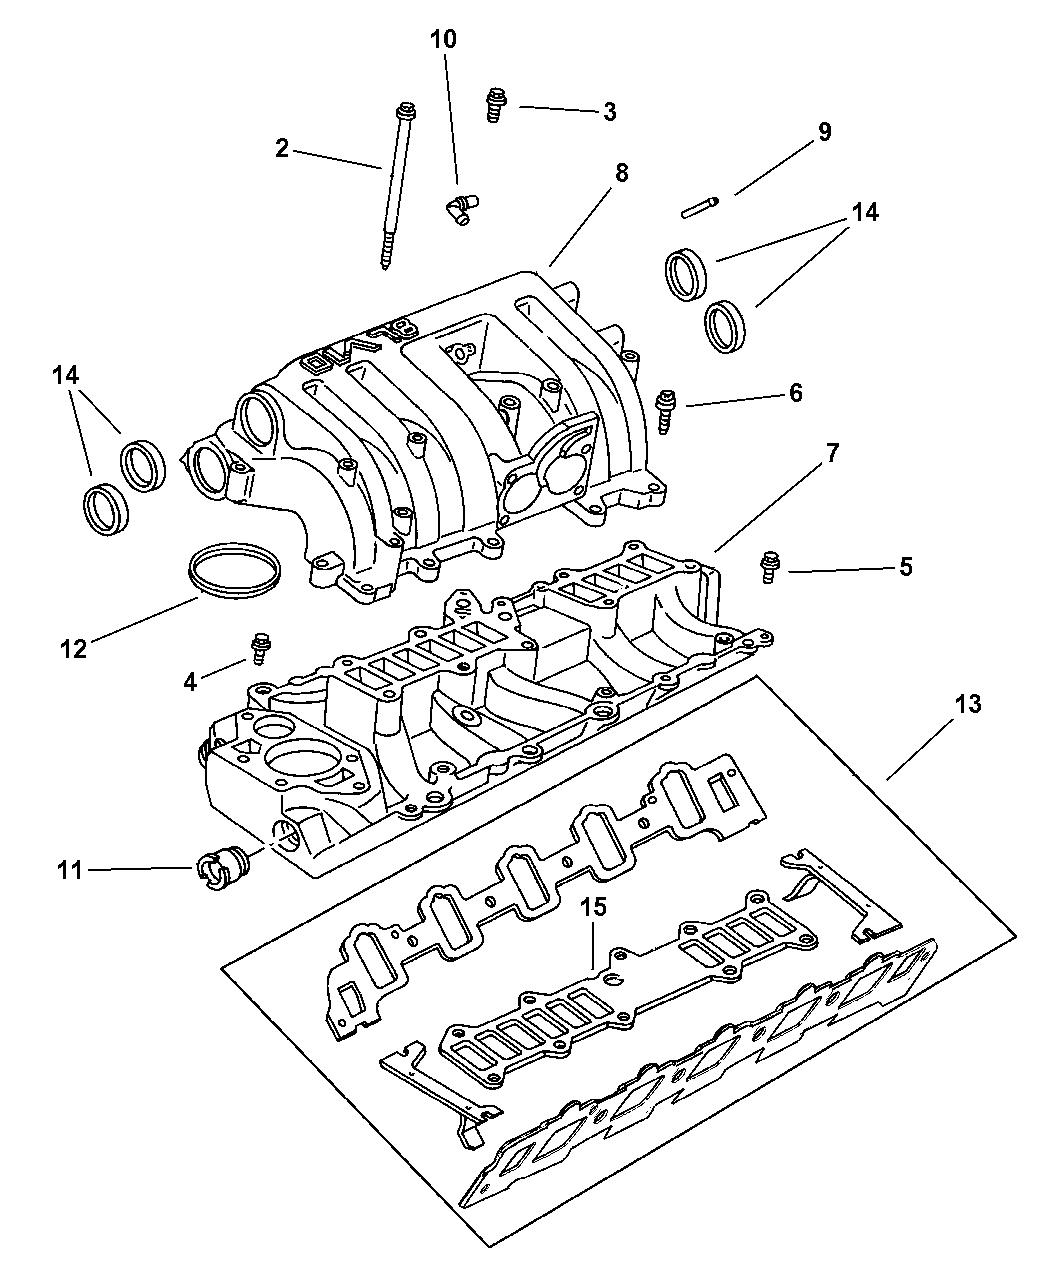 53031583 Genuine Dodge Manifold Intake